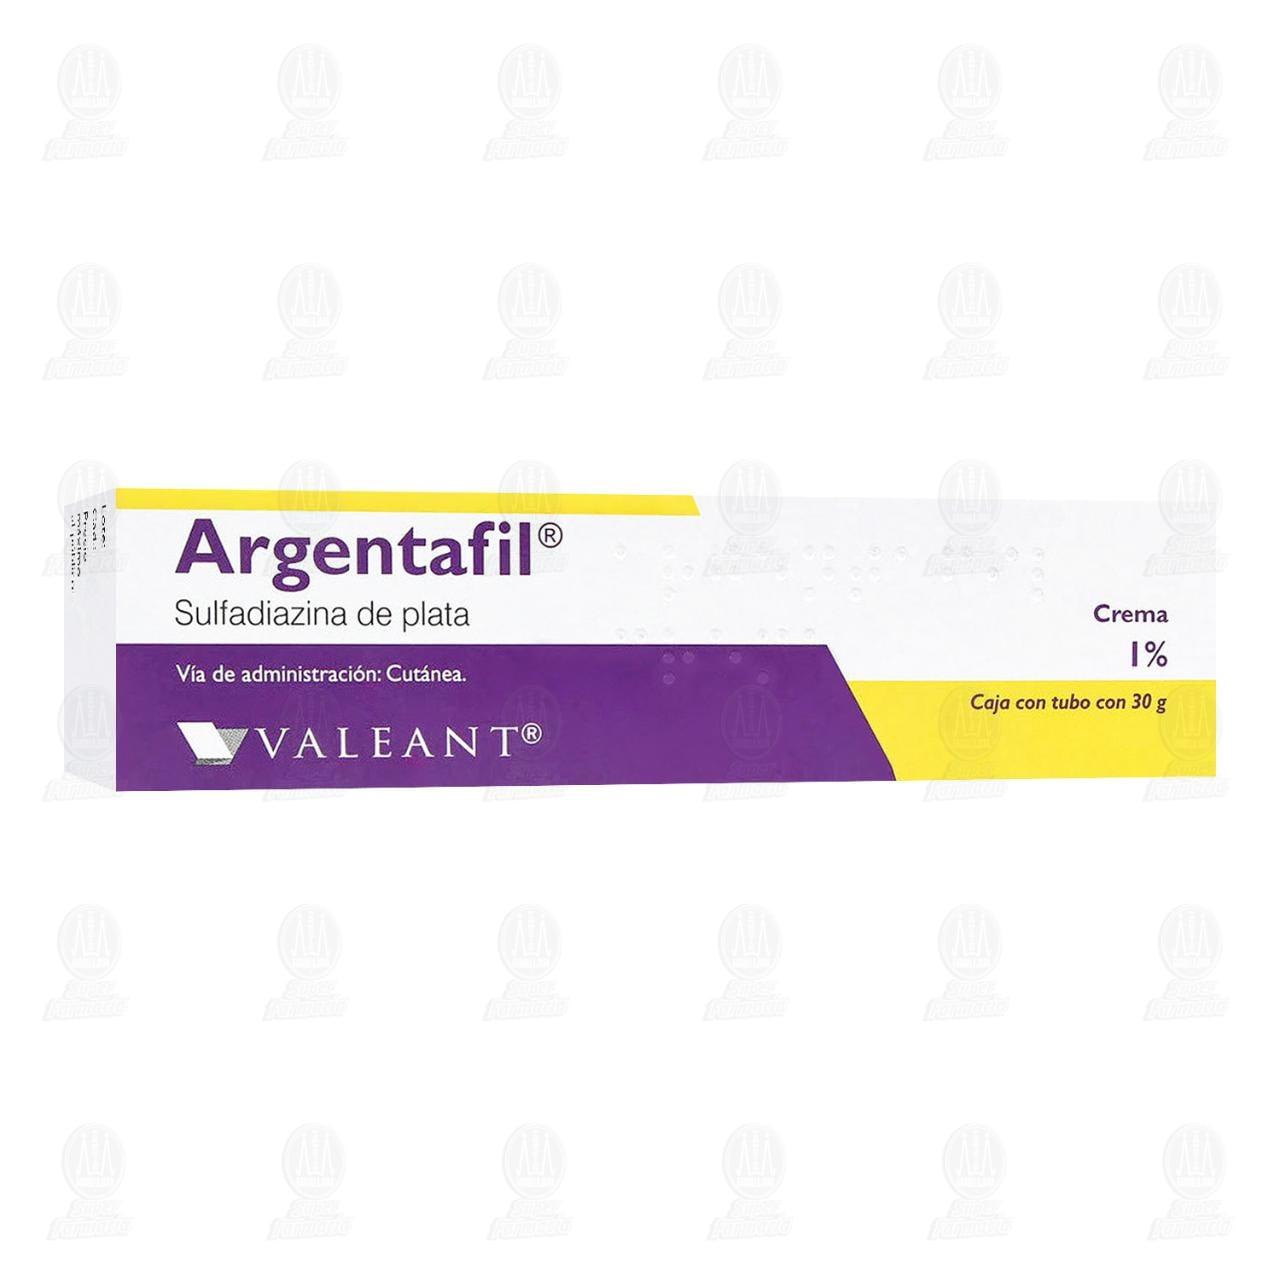 Argentafil 1% 30gr Crema Tubo